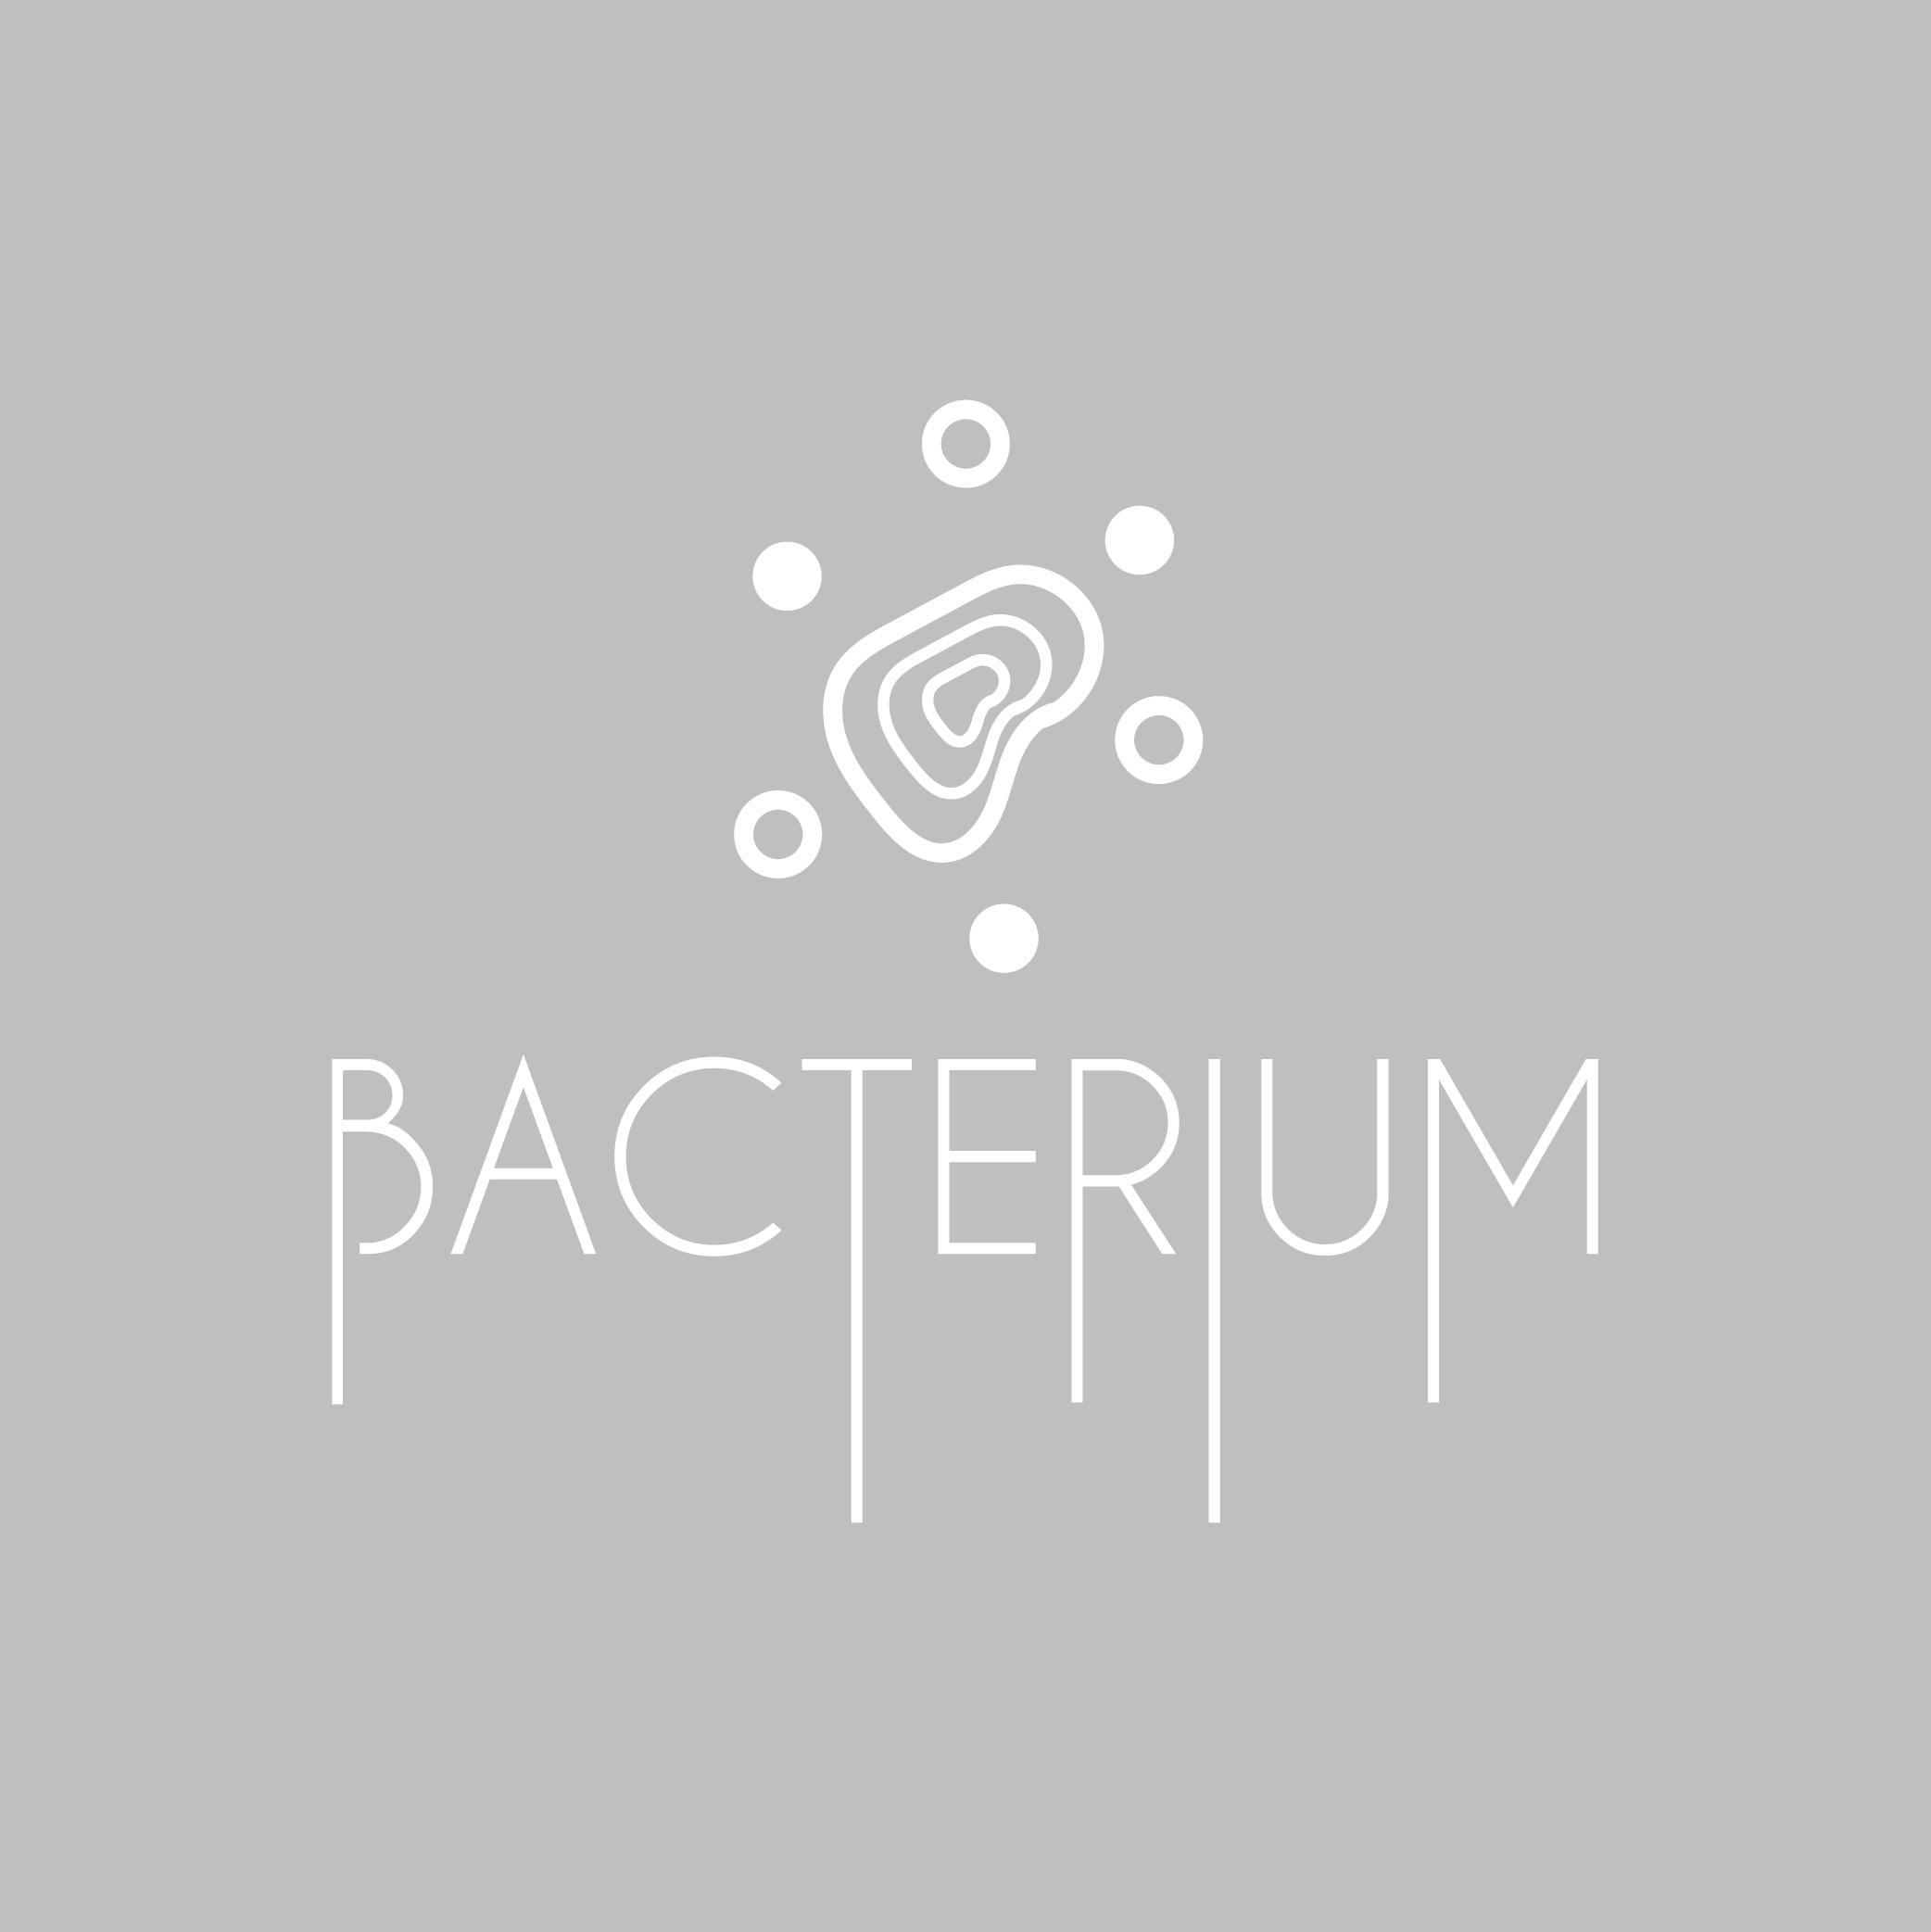 Bacterium Logo Design by Kenzi Green Design #branding #logodesign